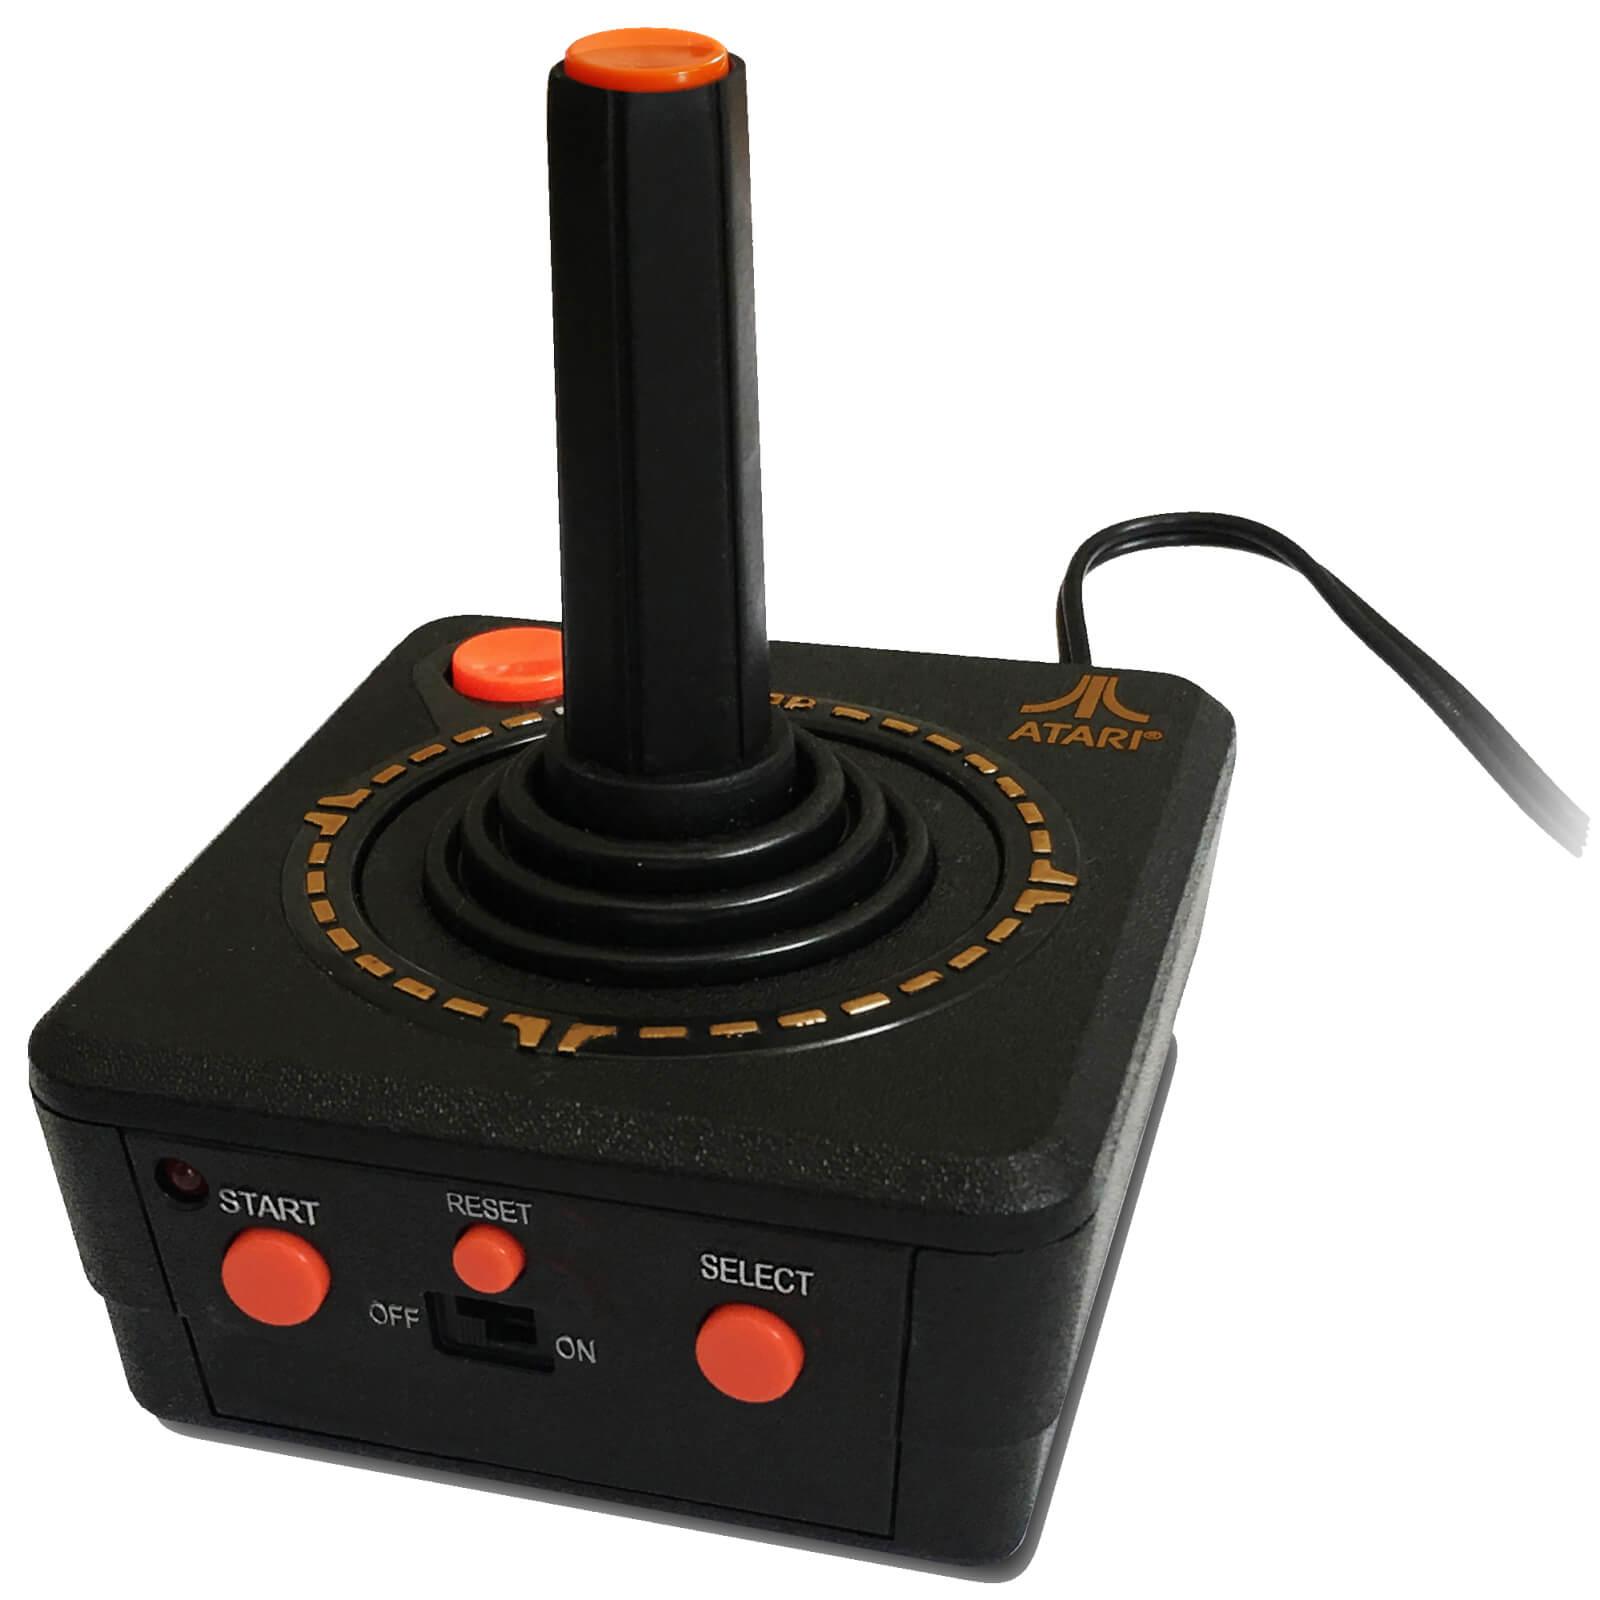 Blaze Atari Retro Tv Plug And Play Joystick Games